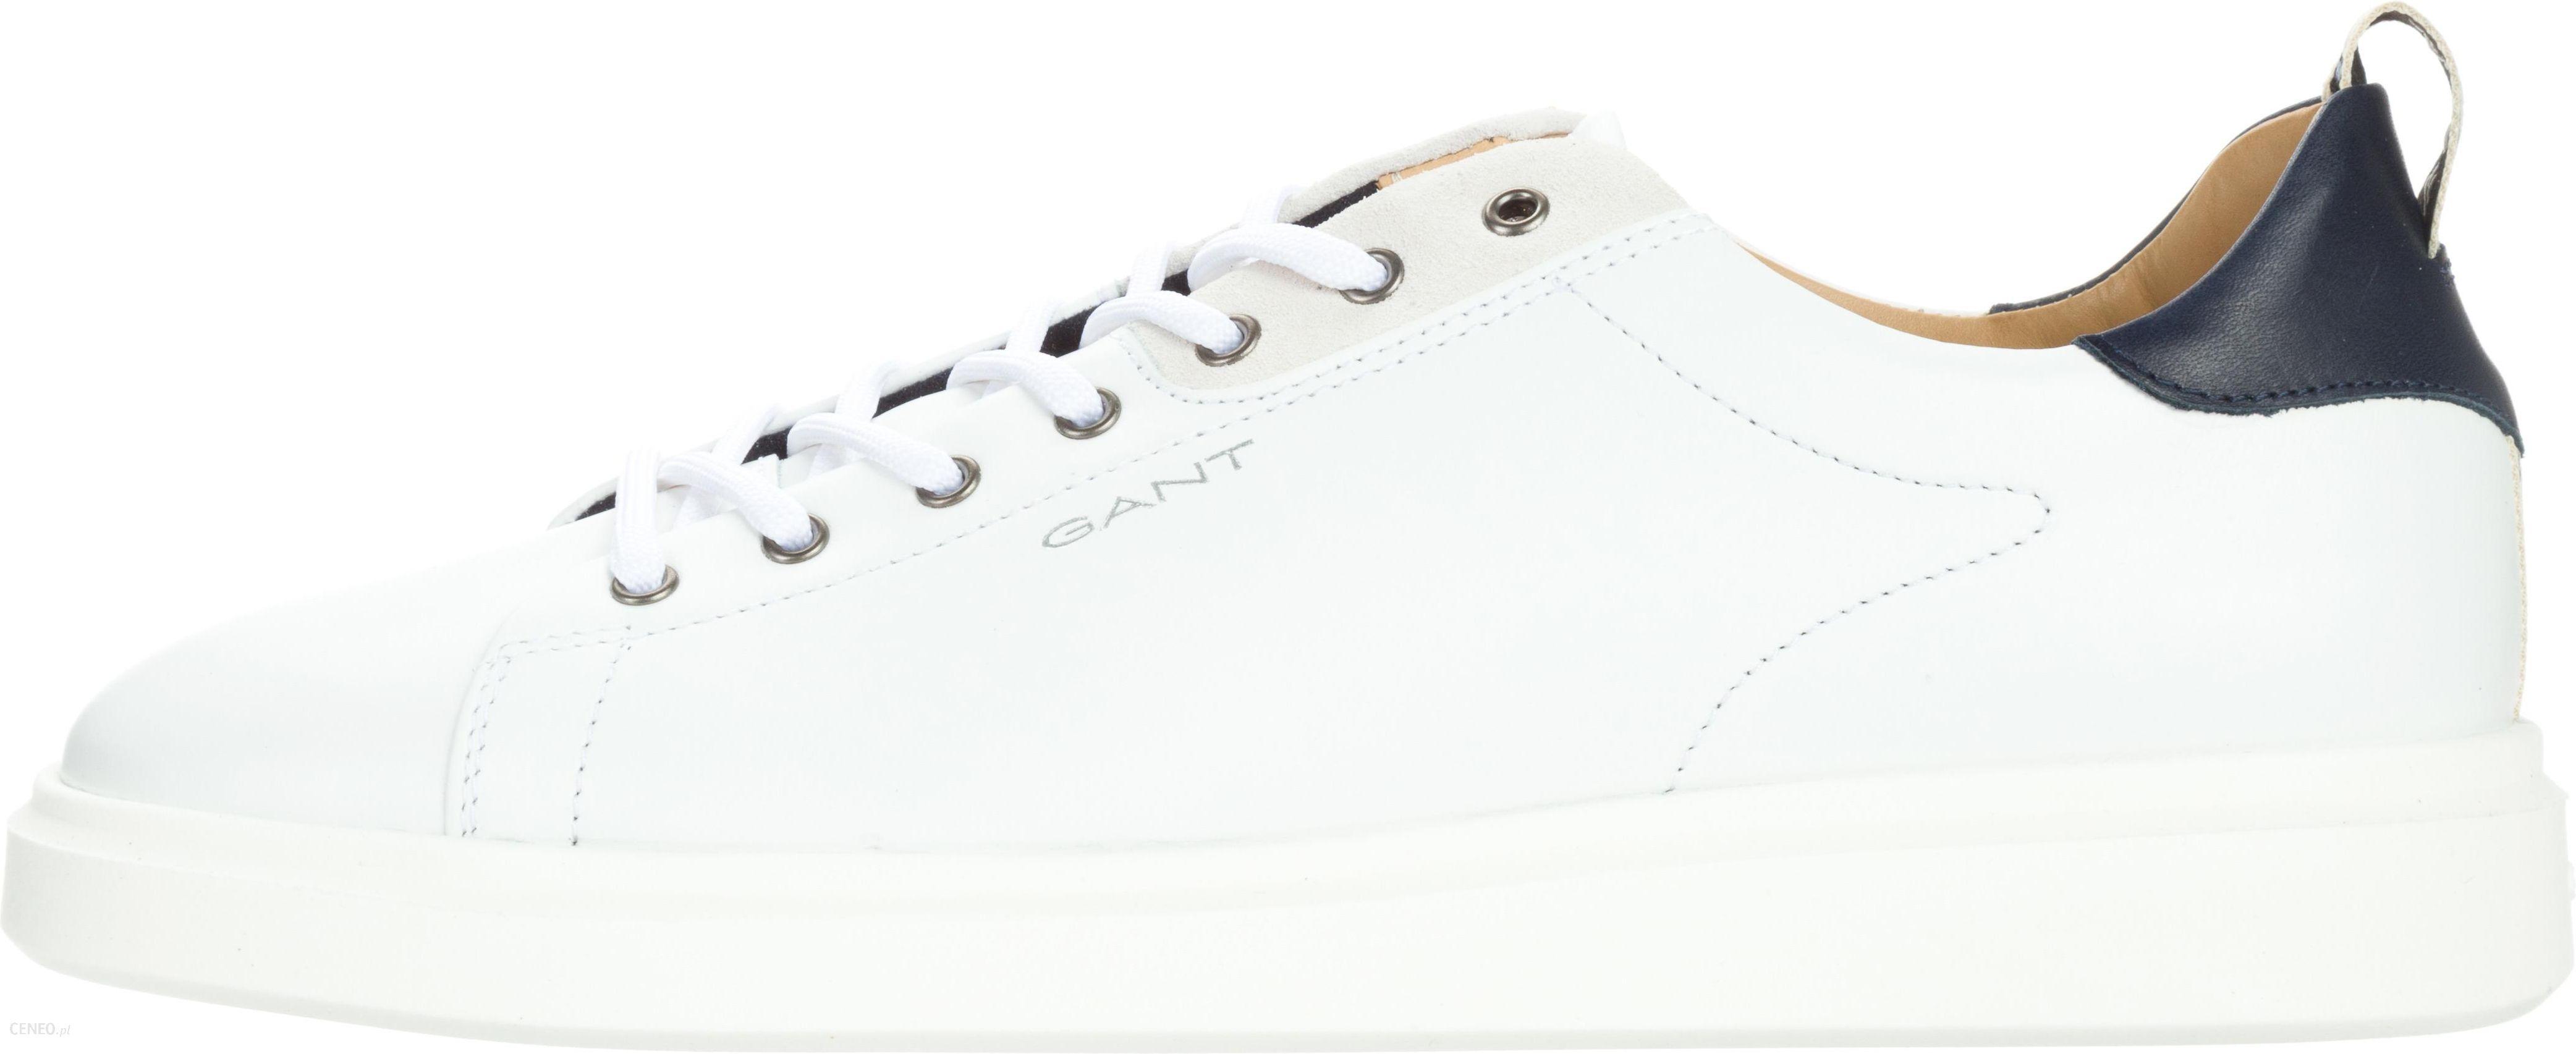 Gant Beacon Sneakers Biały 40 - Ceny i